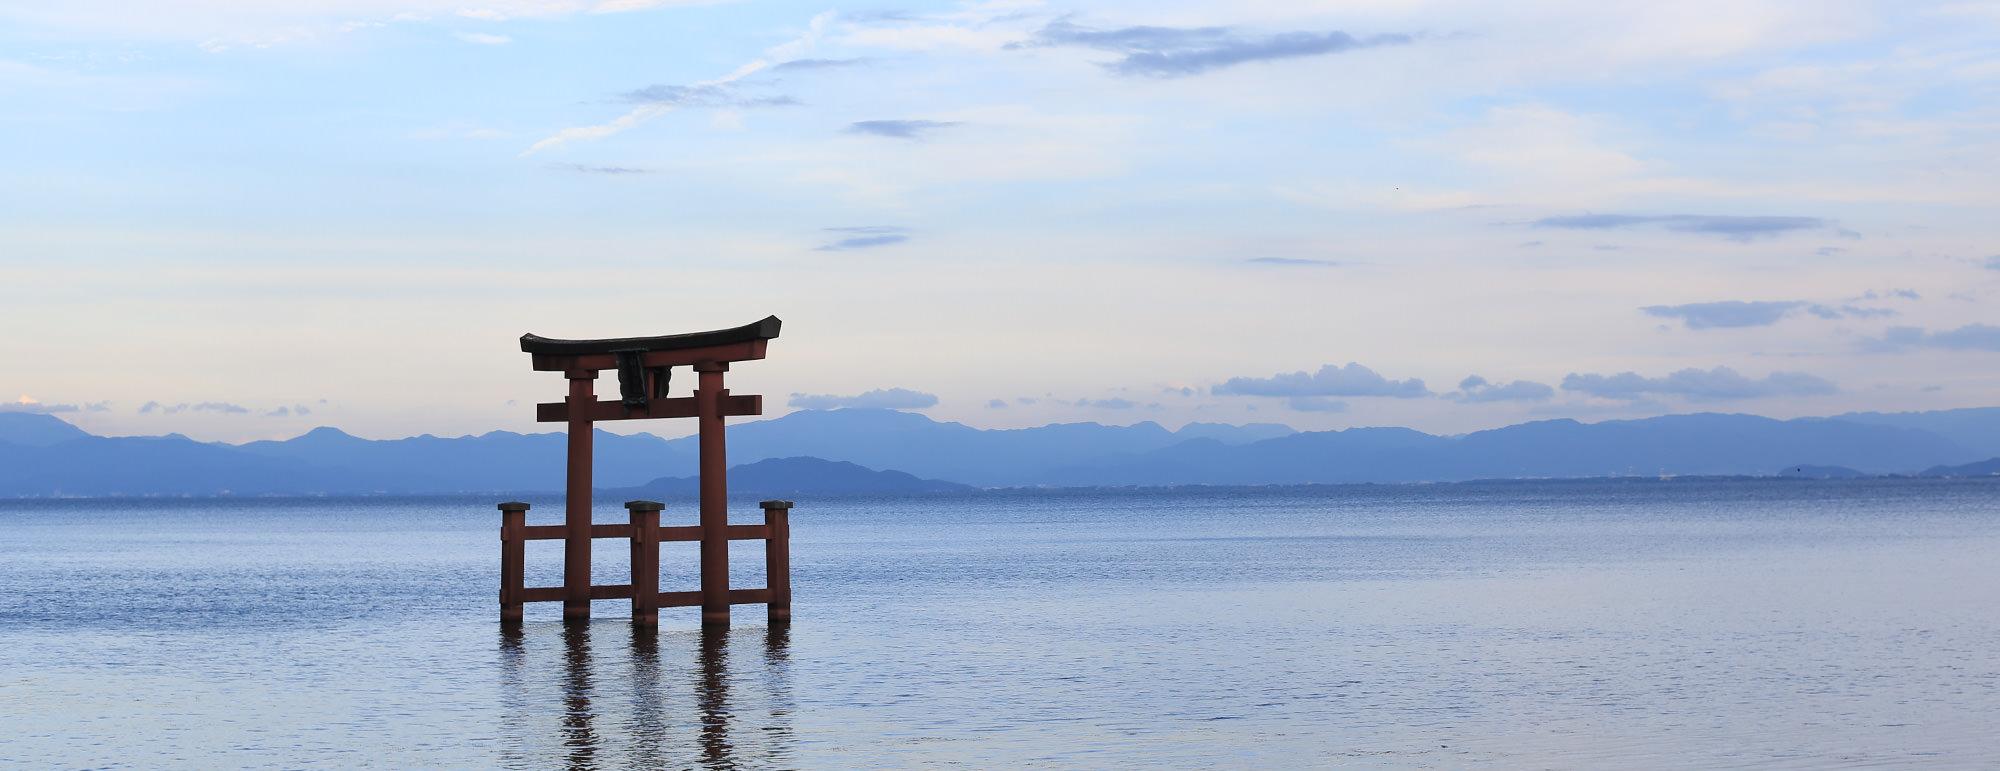 Water Iphone Wallpaper Lake Biwa Shiga Is Japan Cool Travel And Culture Guide